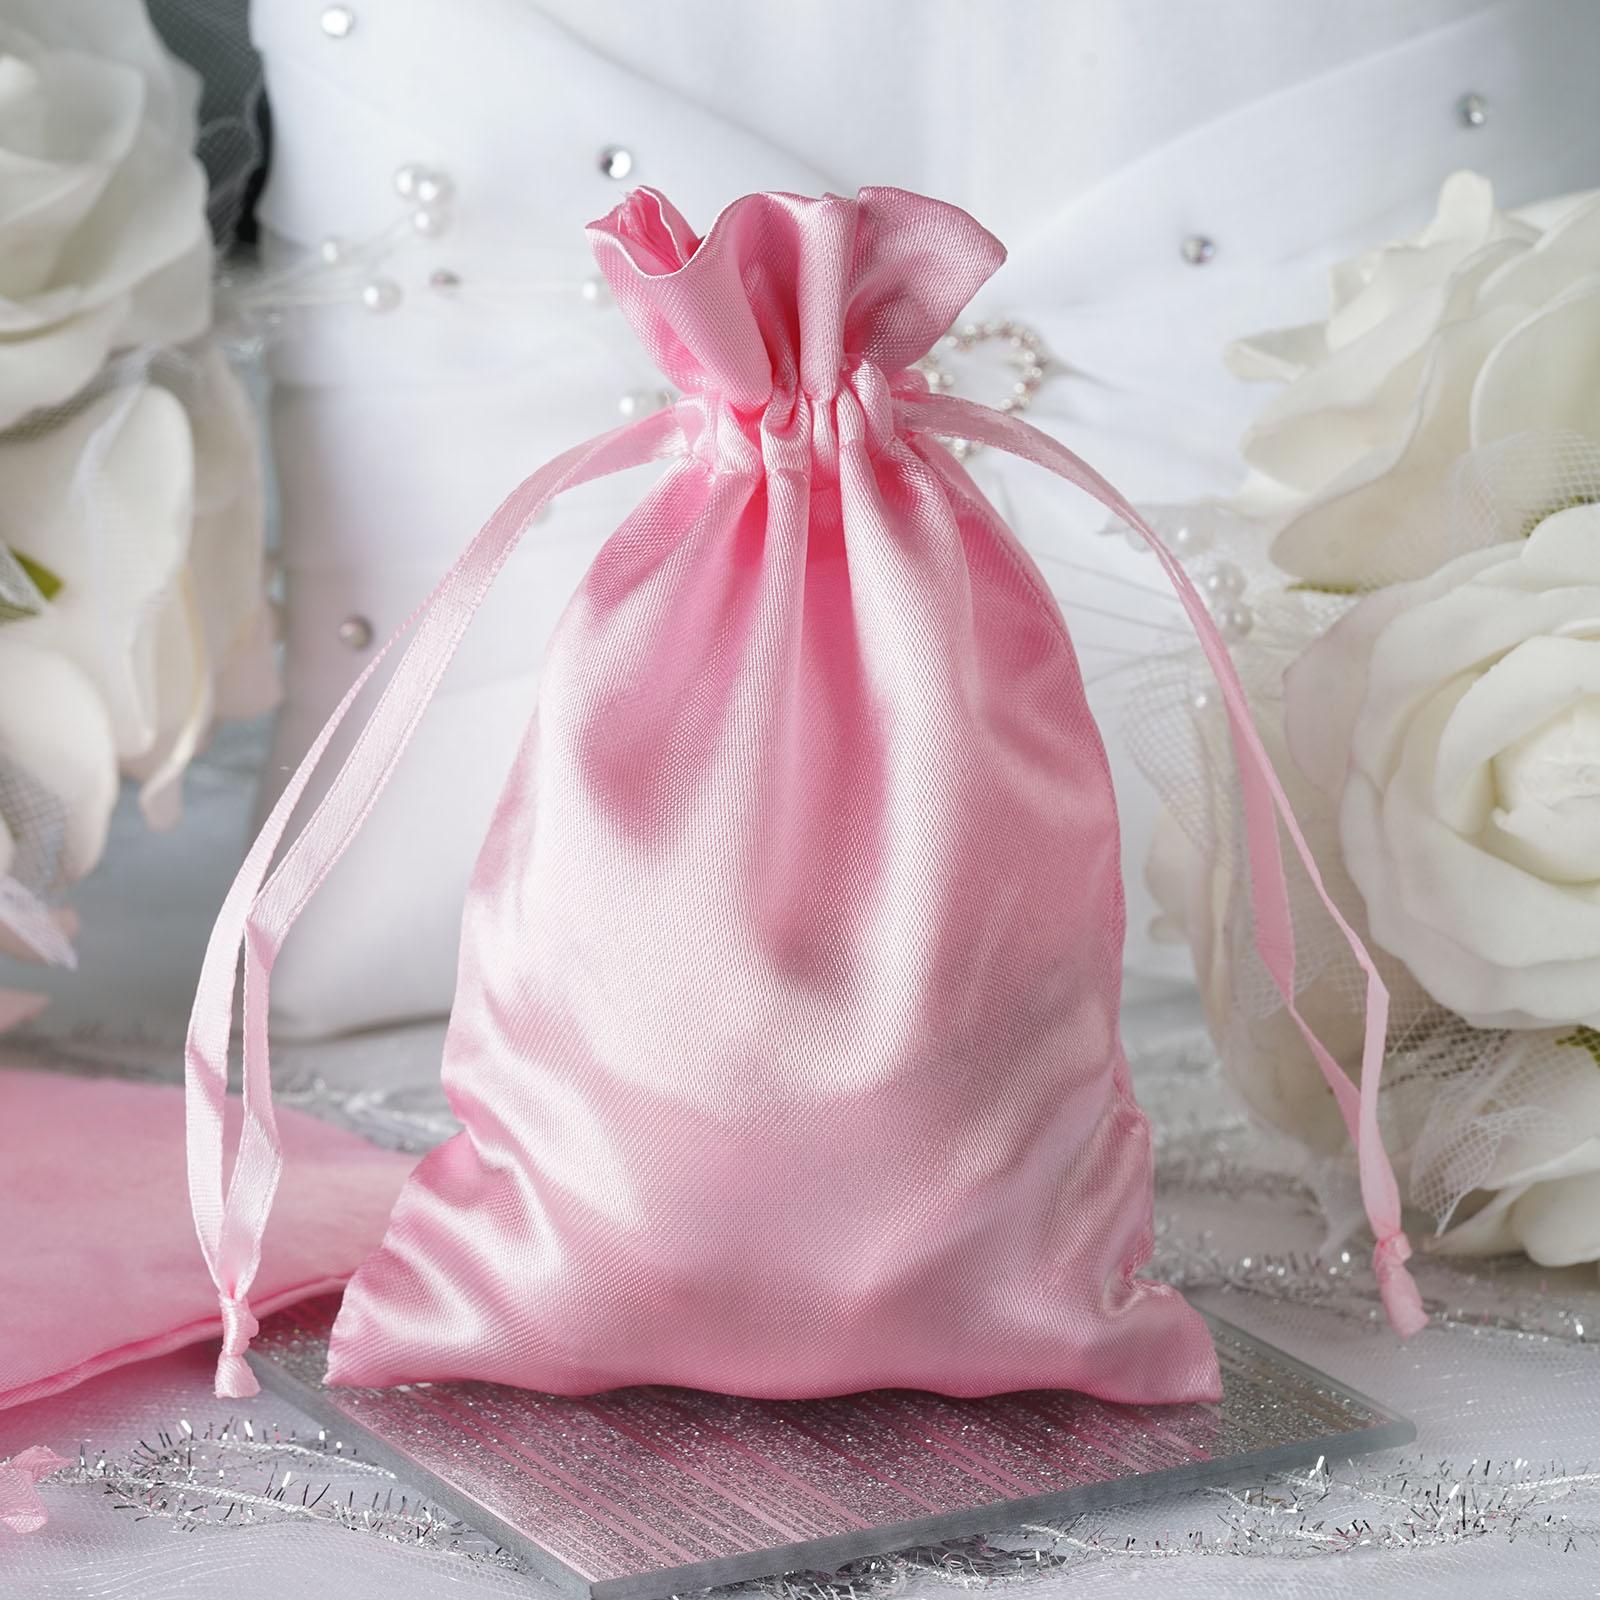 60 Pcs 4x5 Satin Favor Bags Wedding Party Reception Gift Favors